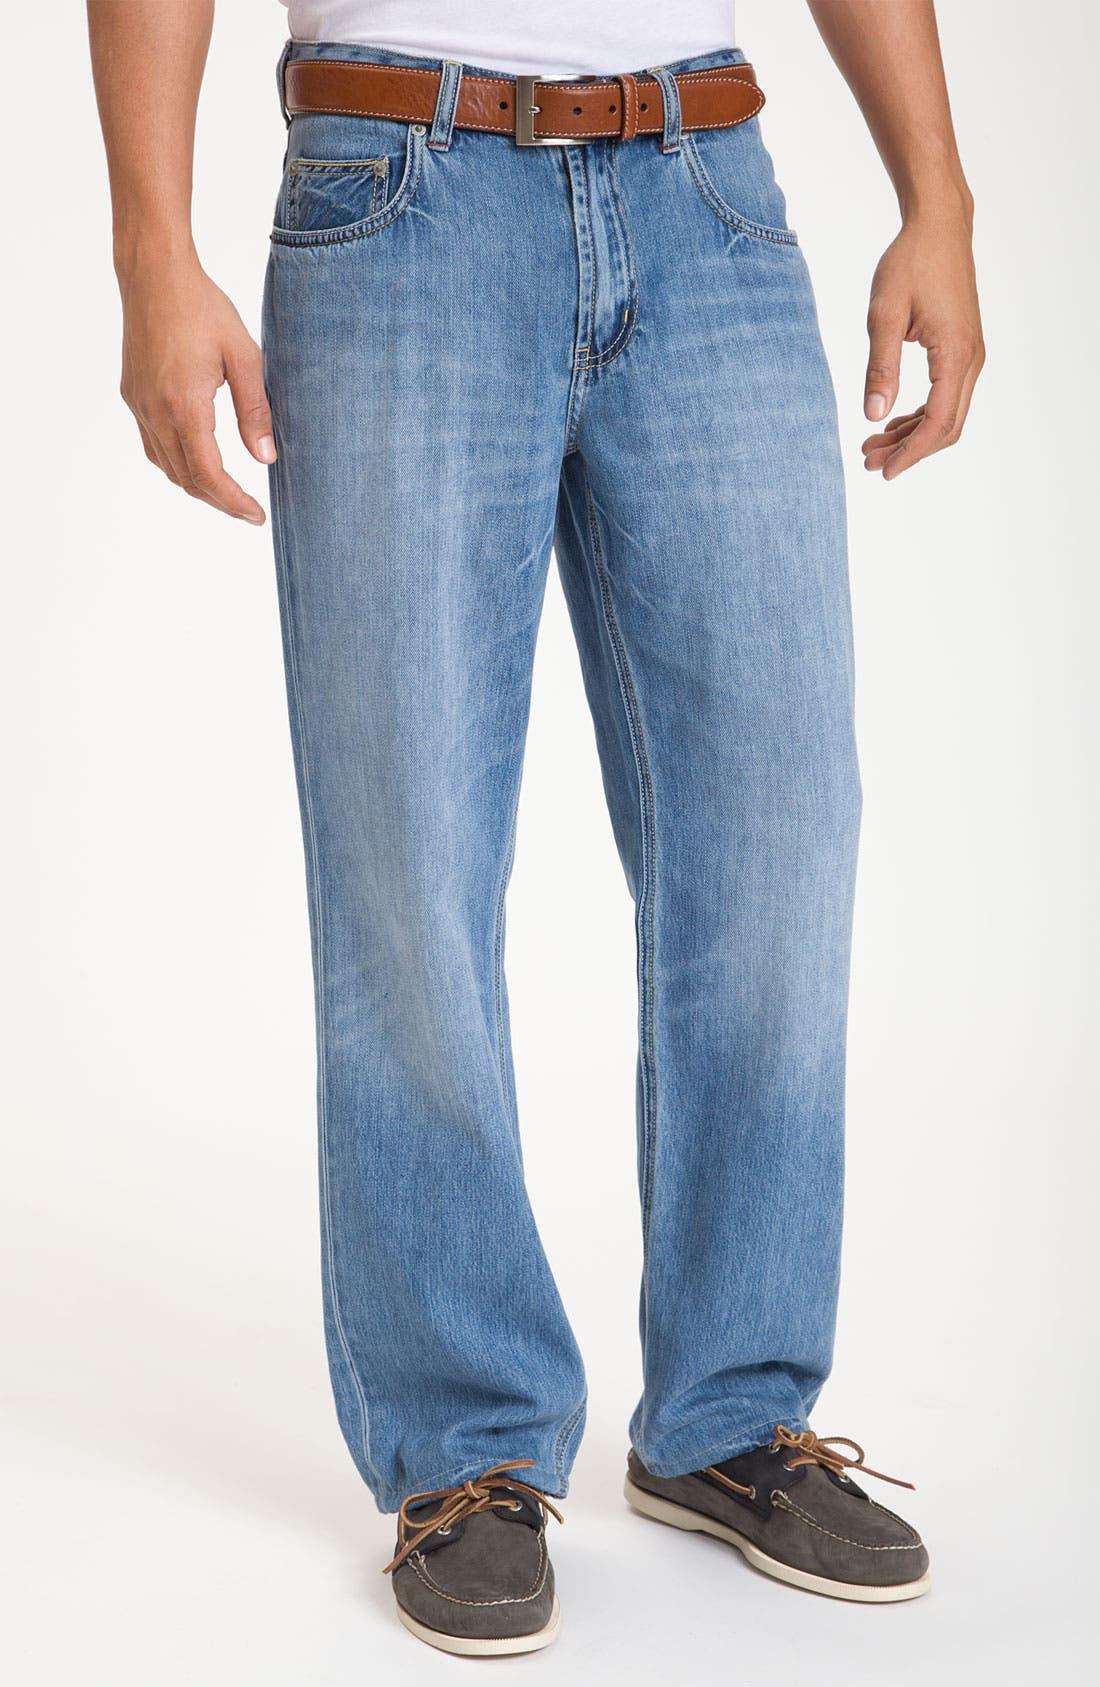 Alternate Image 1 Selected - Tommy Bahama Denim 'Island Ease' Straight Leg Jeans (Vintage Light)